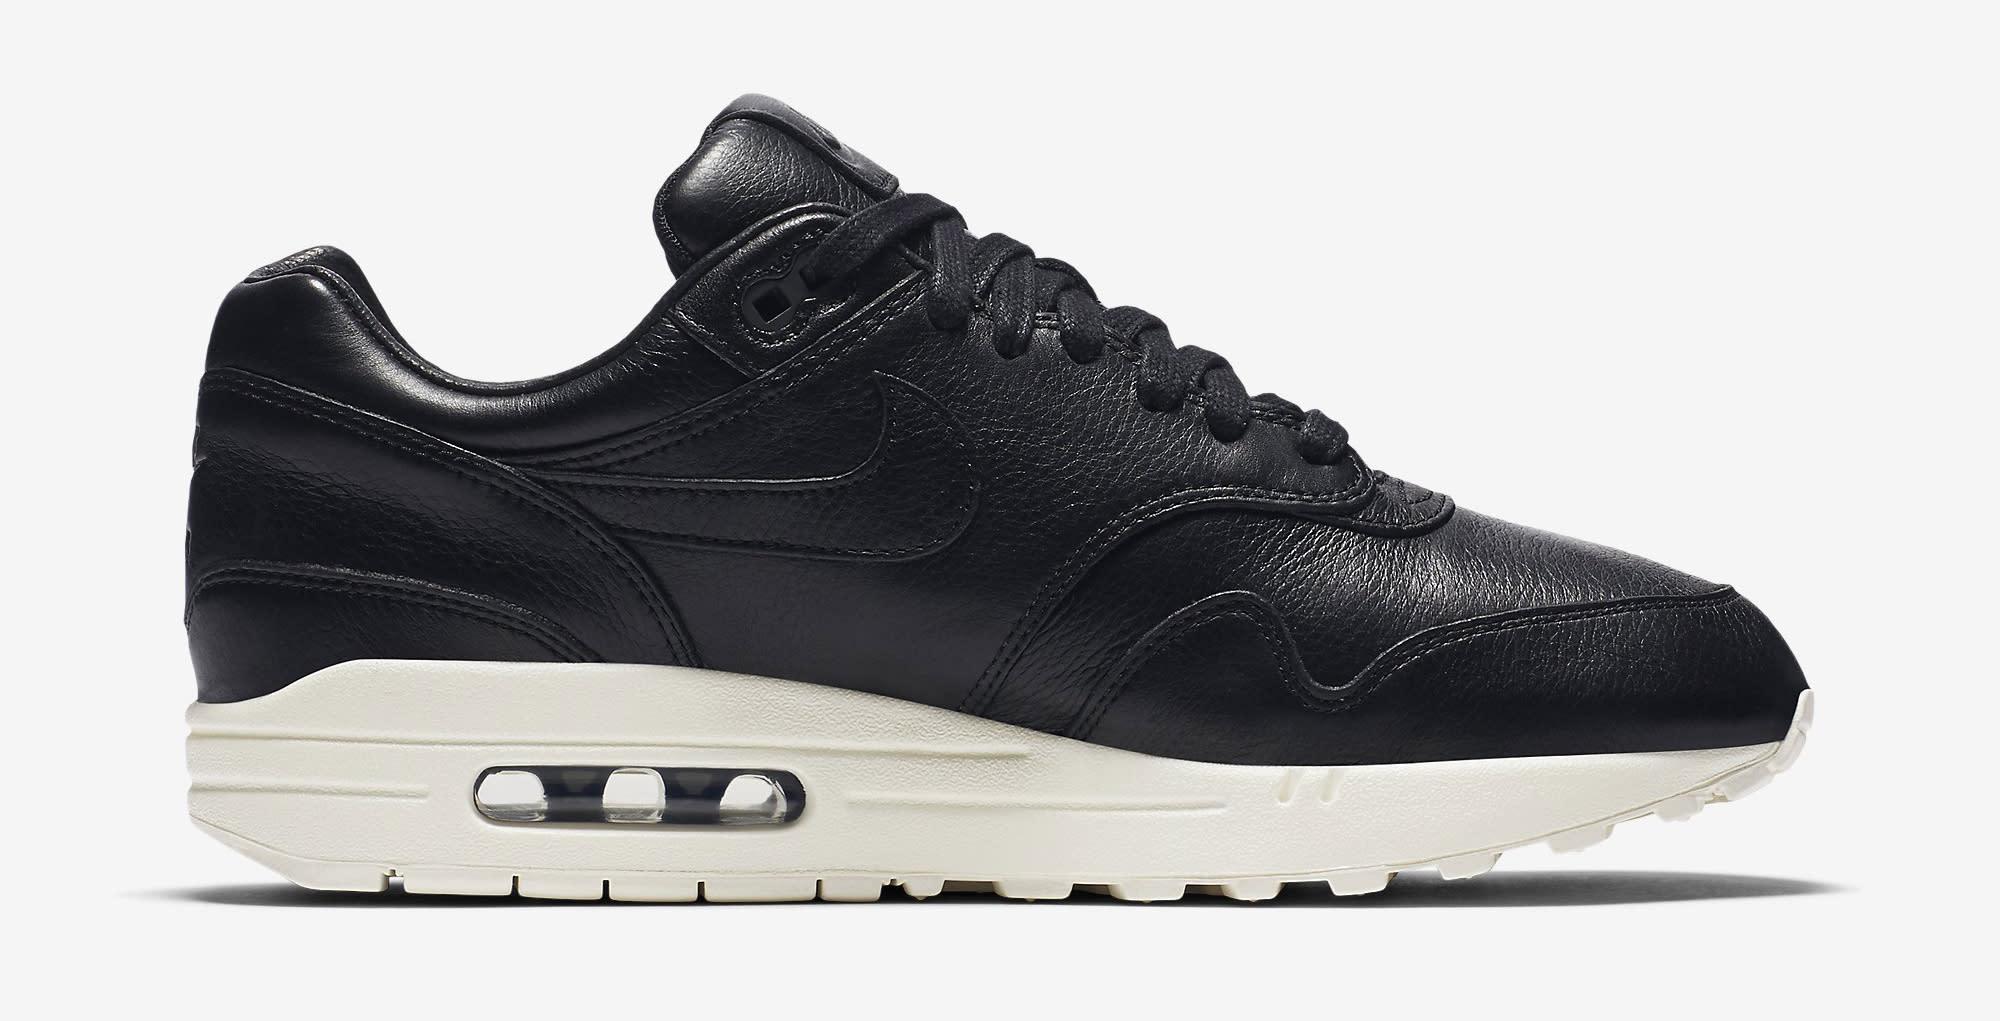 brand new ea6e9 9400b Image via Nike Nike Air Max 1 Pinnacle Leather Black 859554-003 Medial